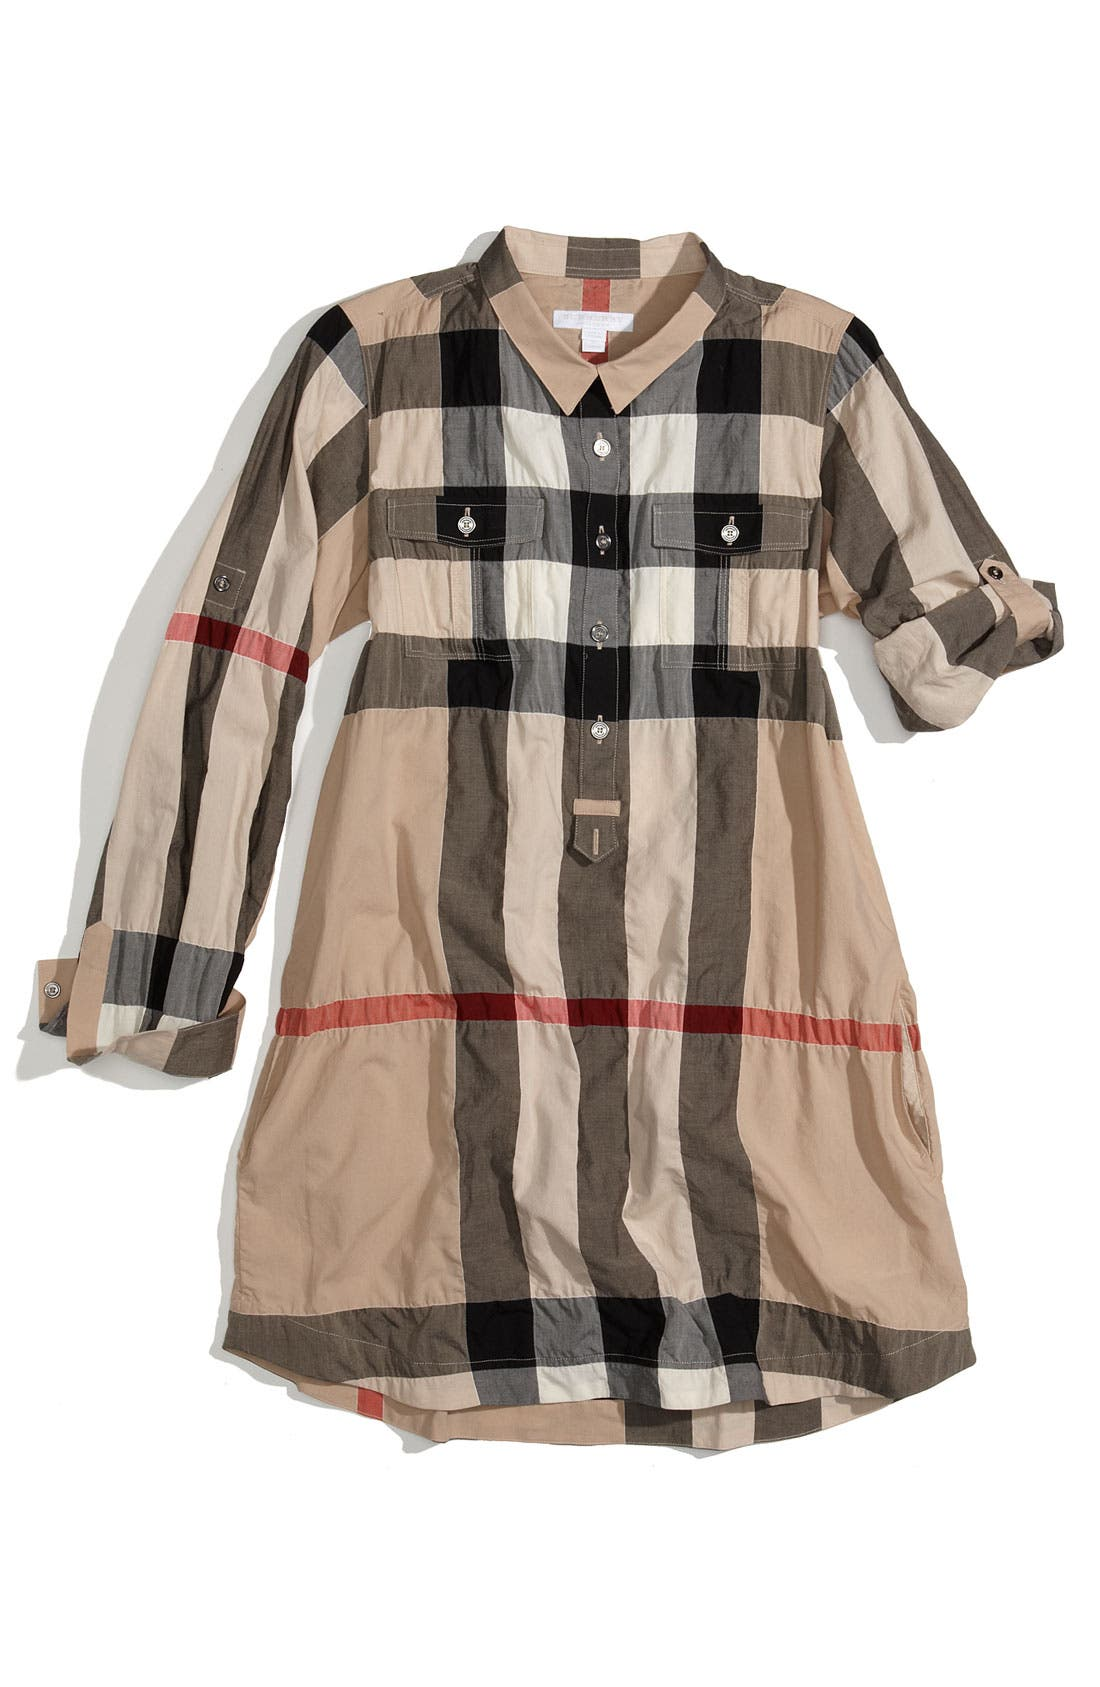 Main Image - Burberry Check Print Shirtdress (Big Girls)